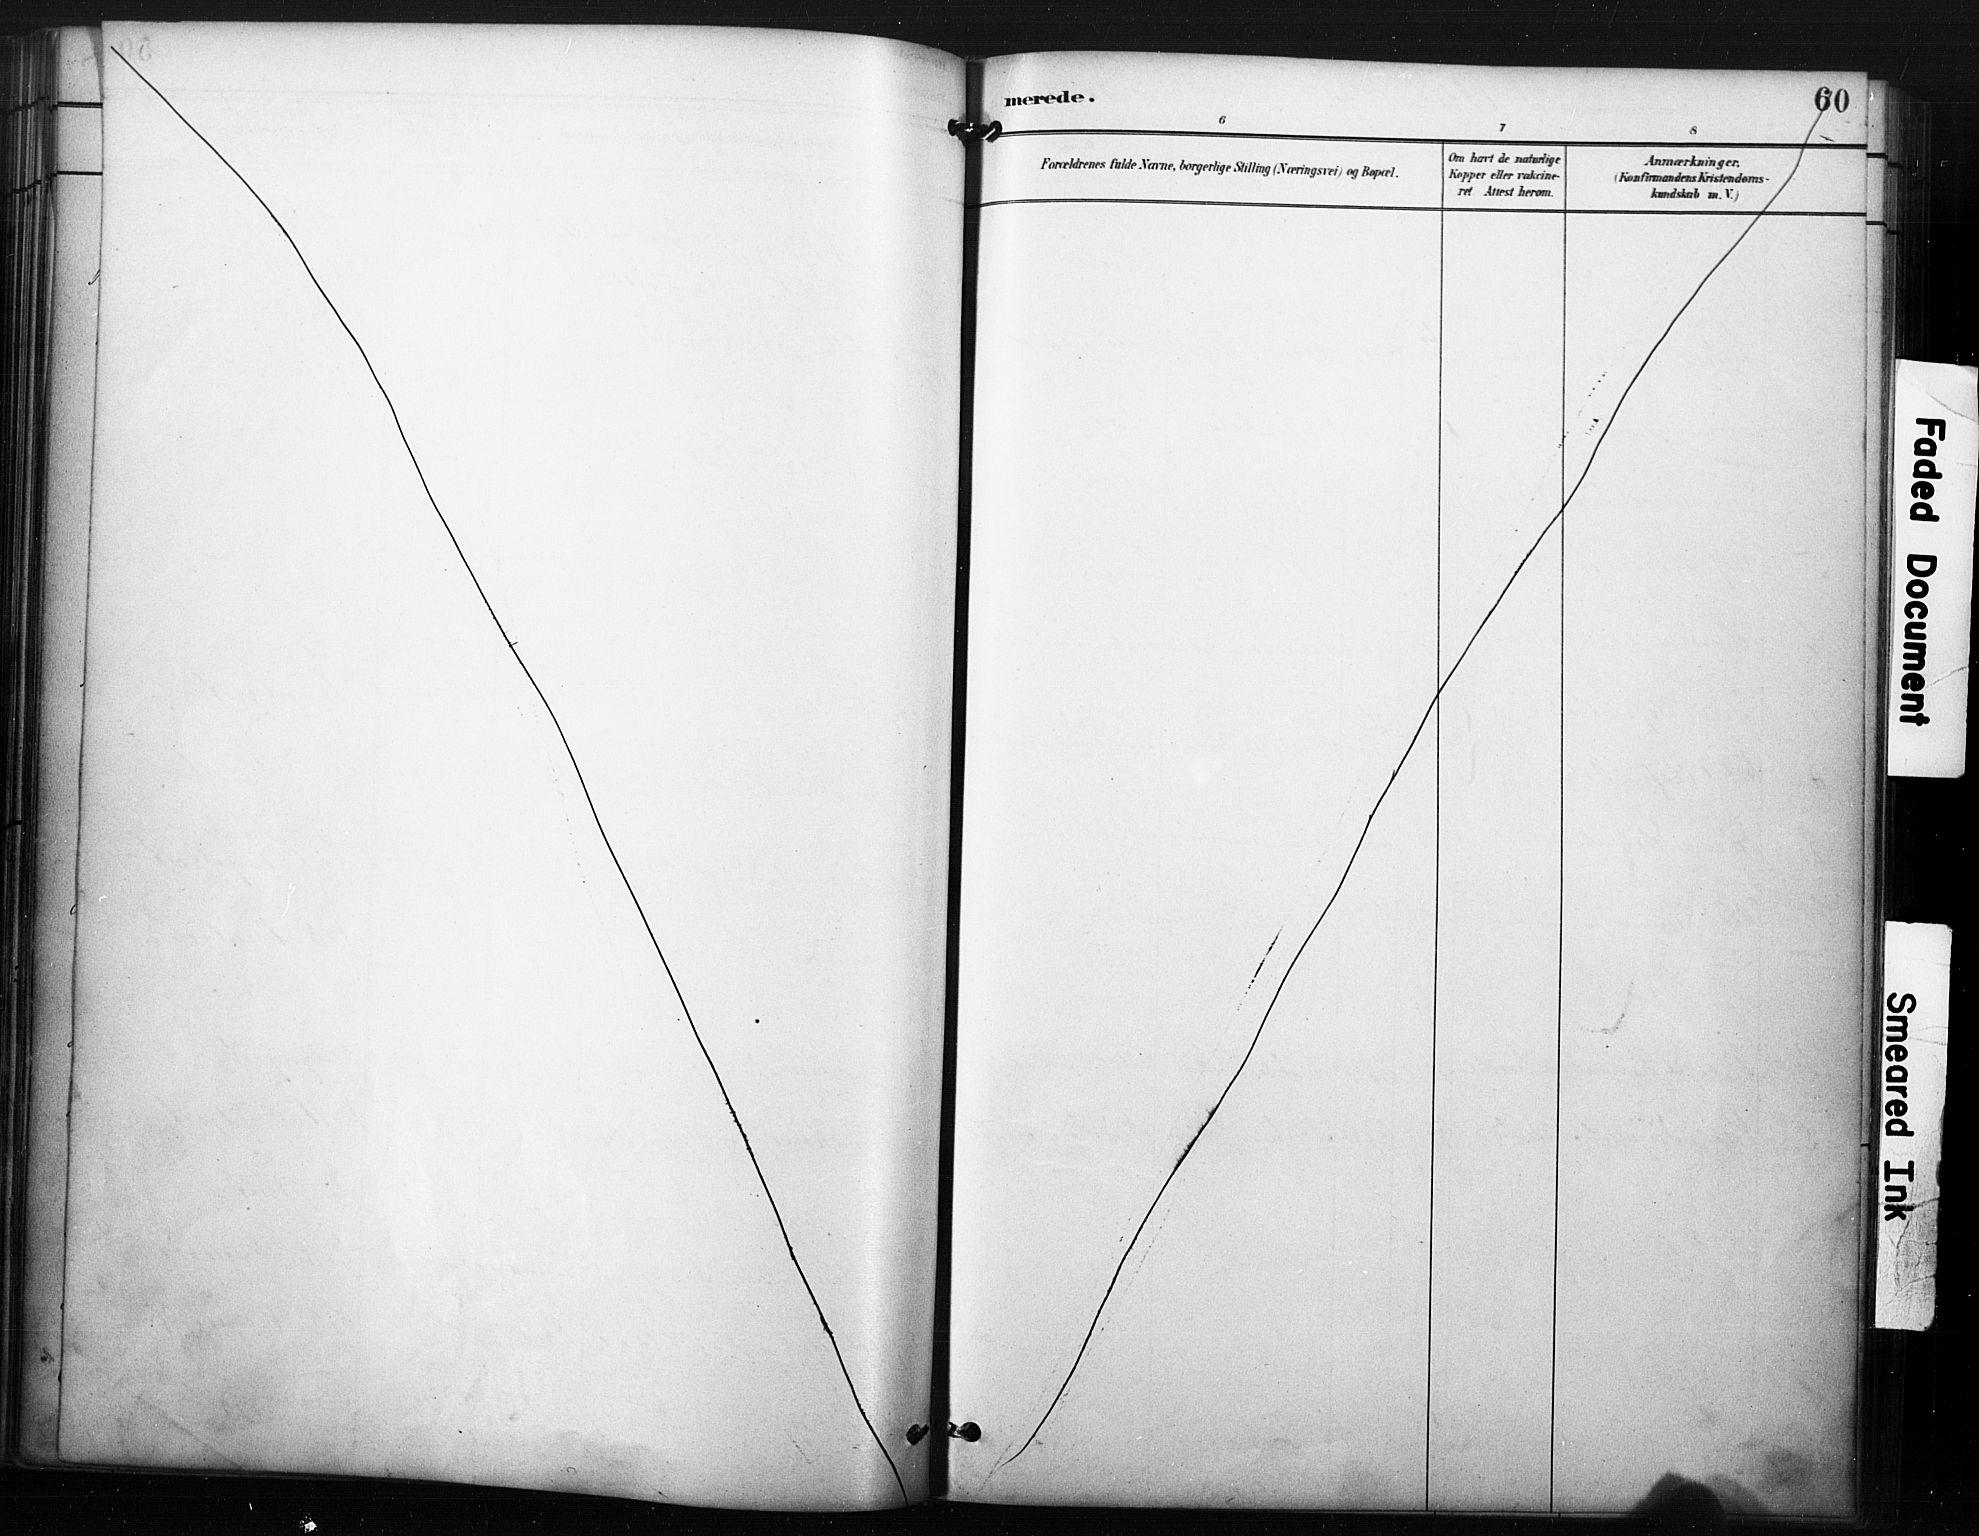 SAKO, Kviteseid kirkebøker, F/Fc/L0002: Ministerialbok nr. III 2, 1882-1908, s. 60